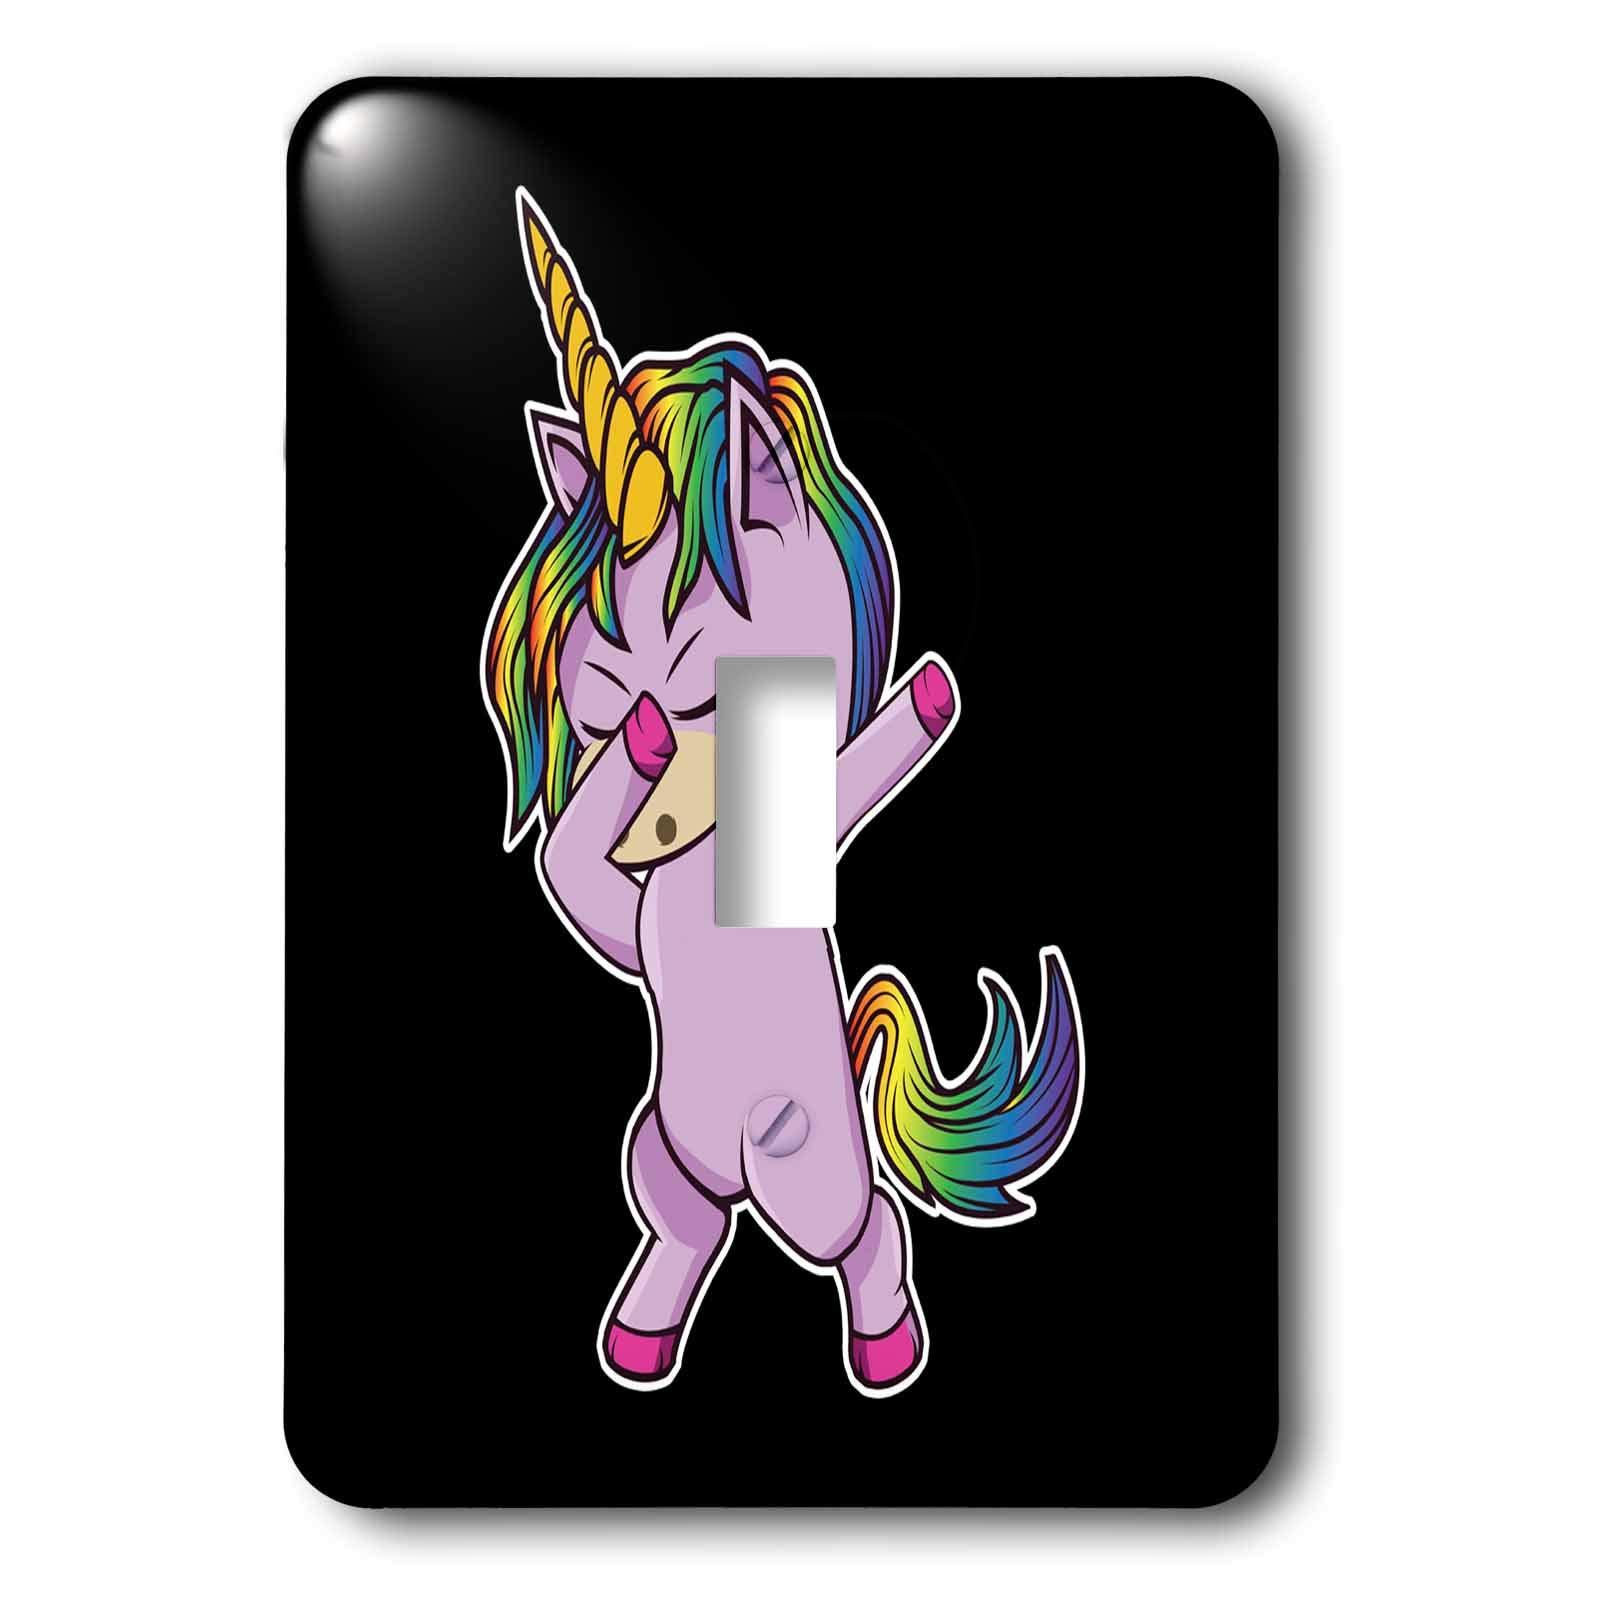 3dRose Sven Herkenrath - Animal - Cute Little Pink Dab Dabbing Unicorn on Black Background - Light Switch Covers - single toggle switch (lsp_290743_1)